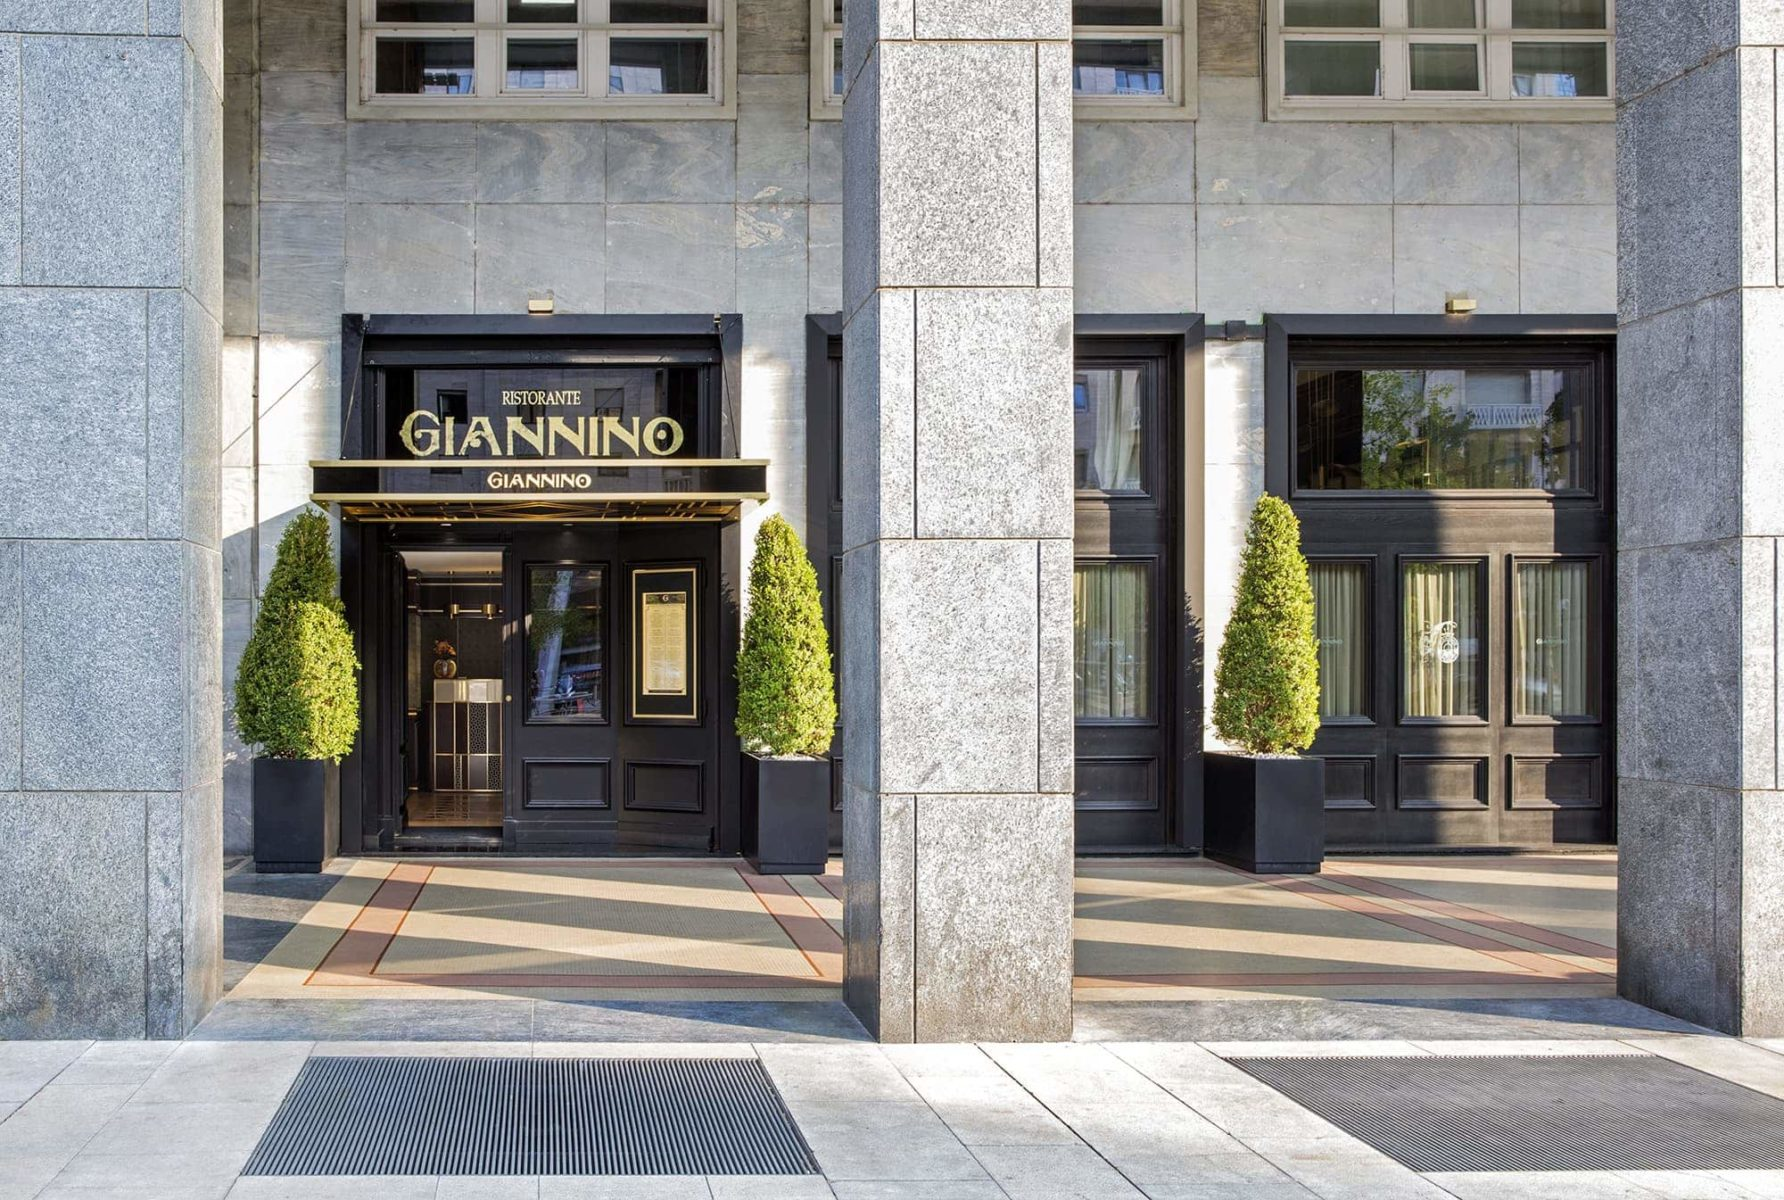 Restaurant Giannino Milan